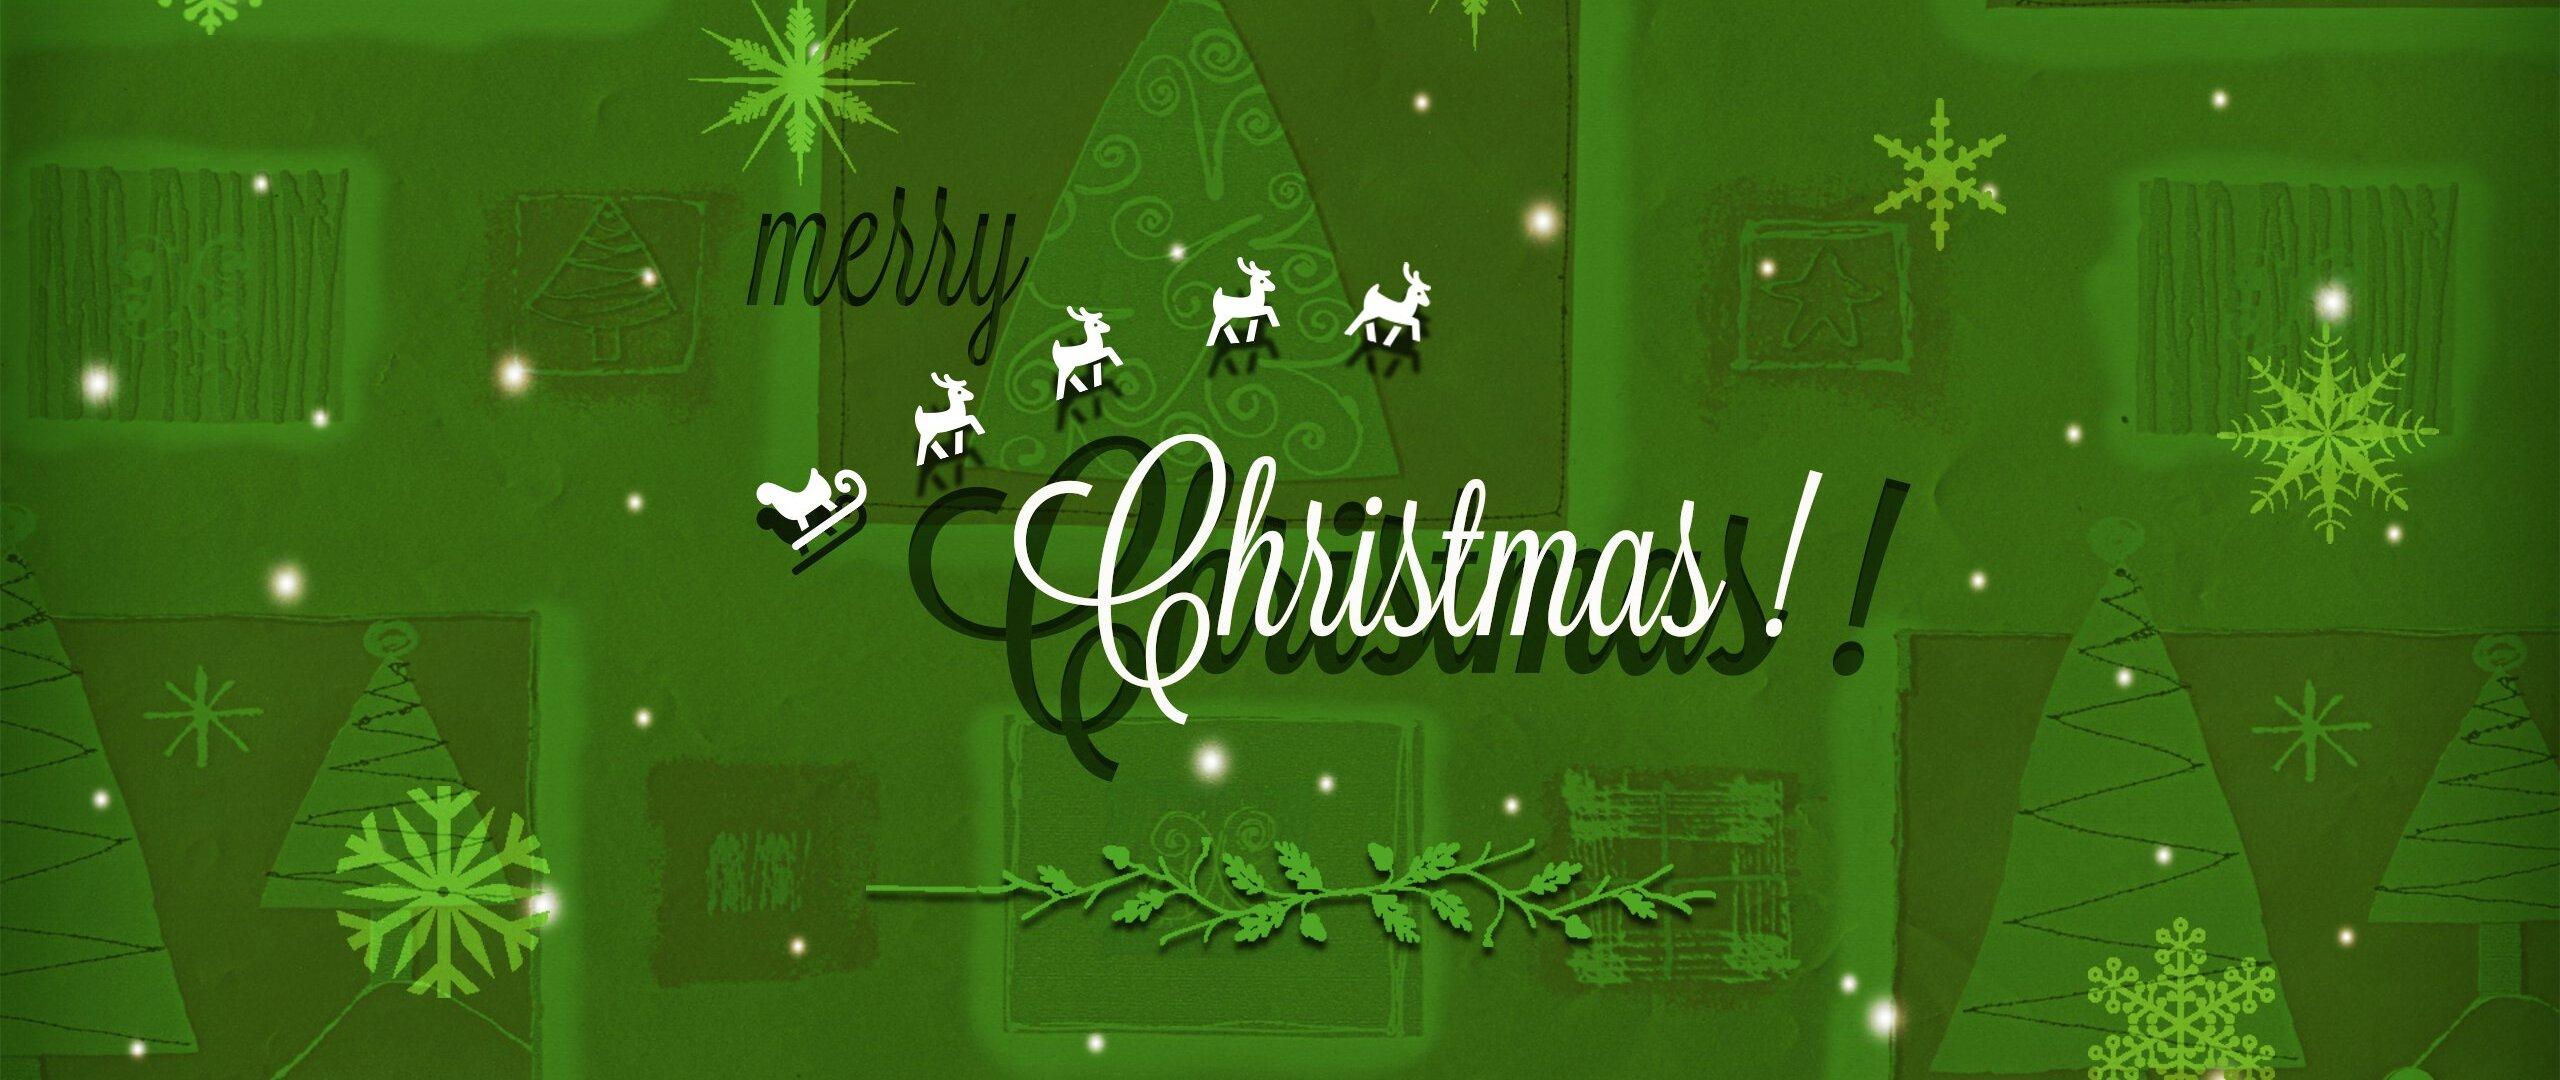 merry-christmas-hd.jpg